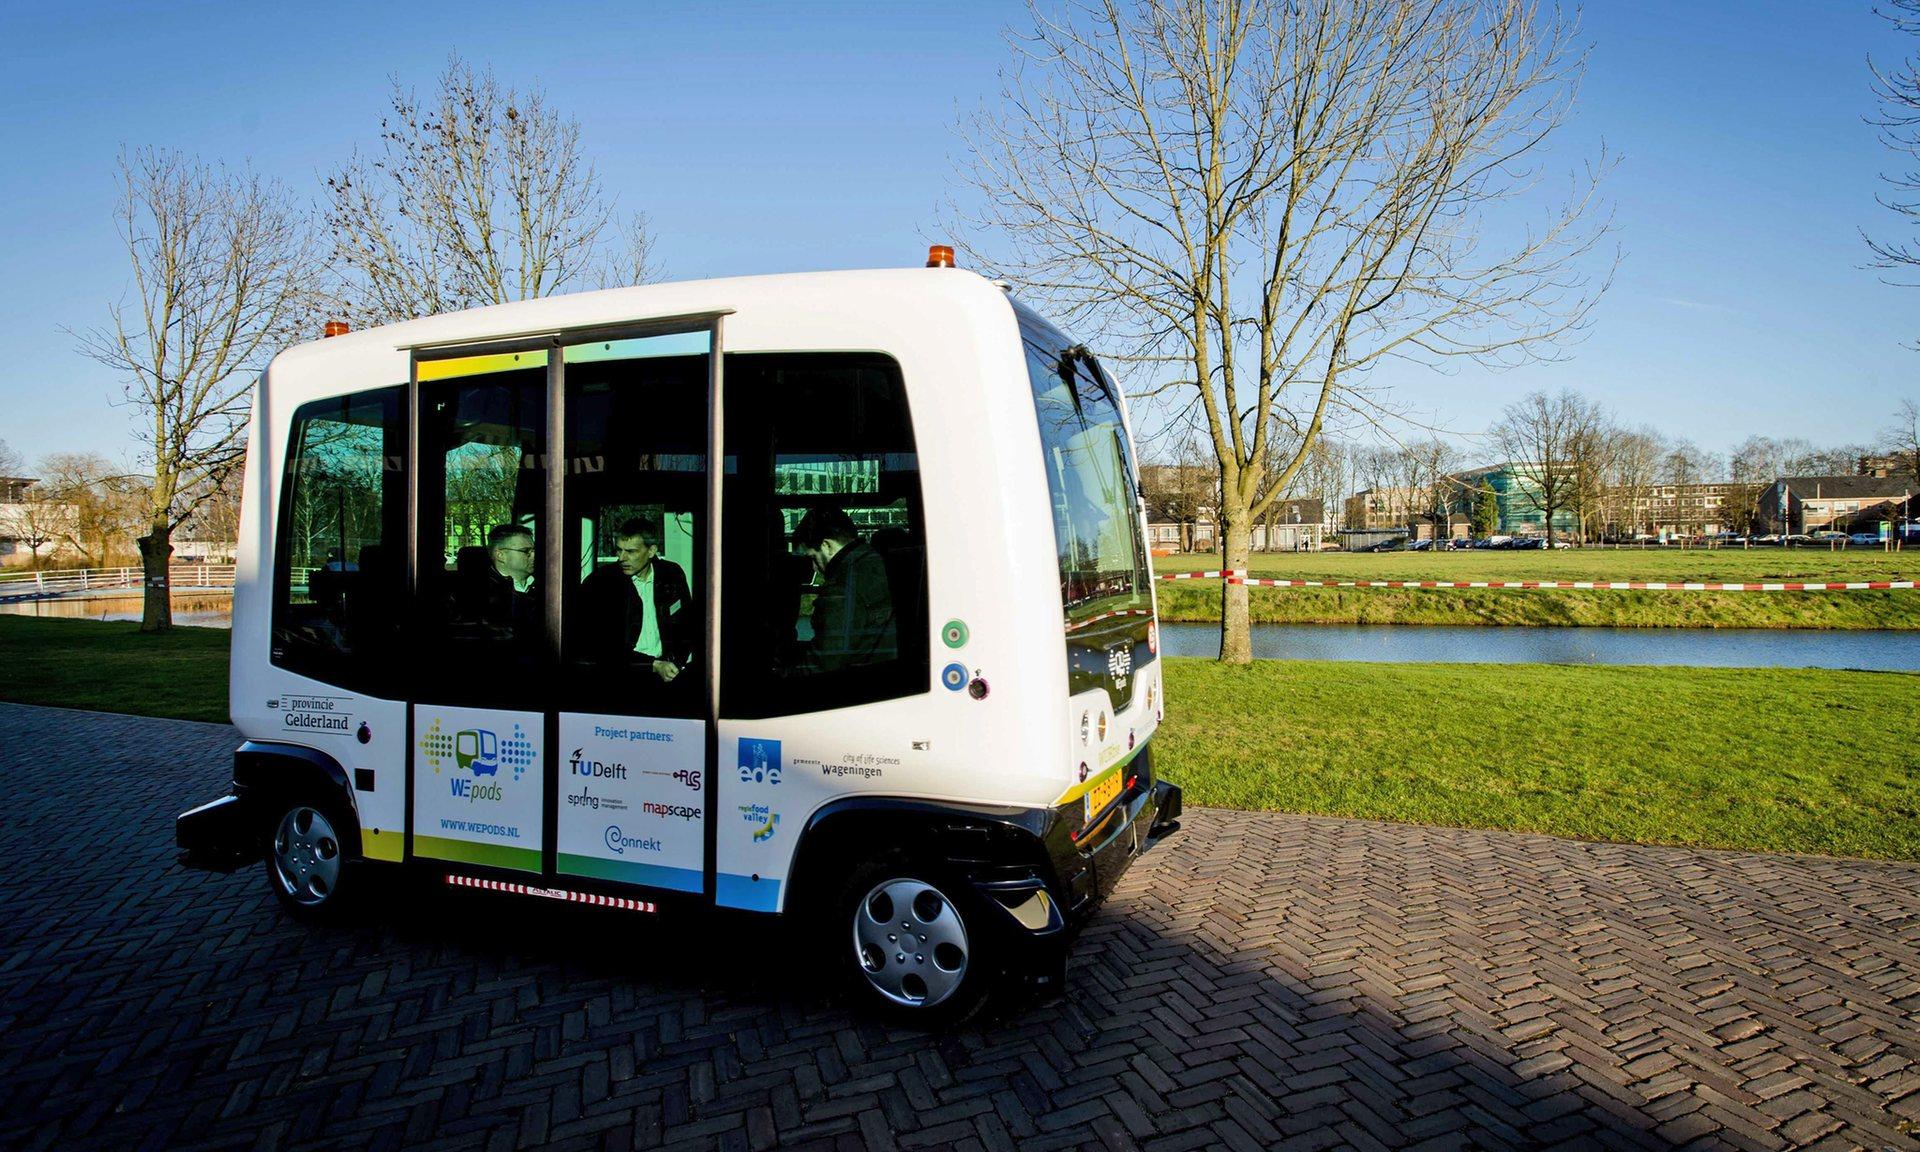 The EasyMile EZ-10 minibus will be rolling out in Helsinki. Credit: Robin van Lonkhuijsen/EPA